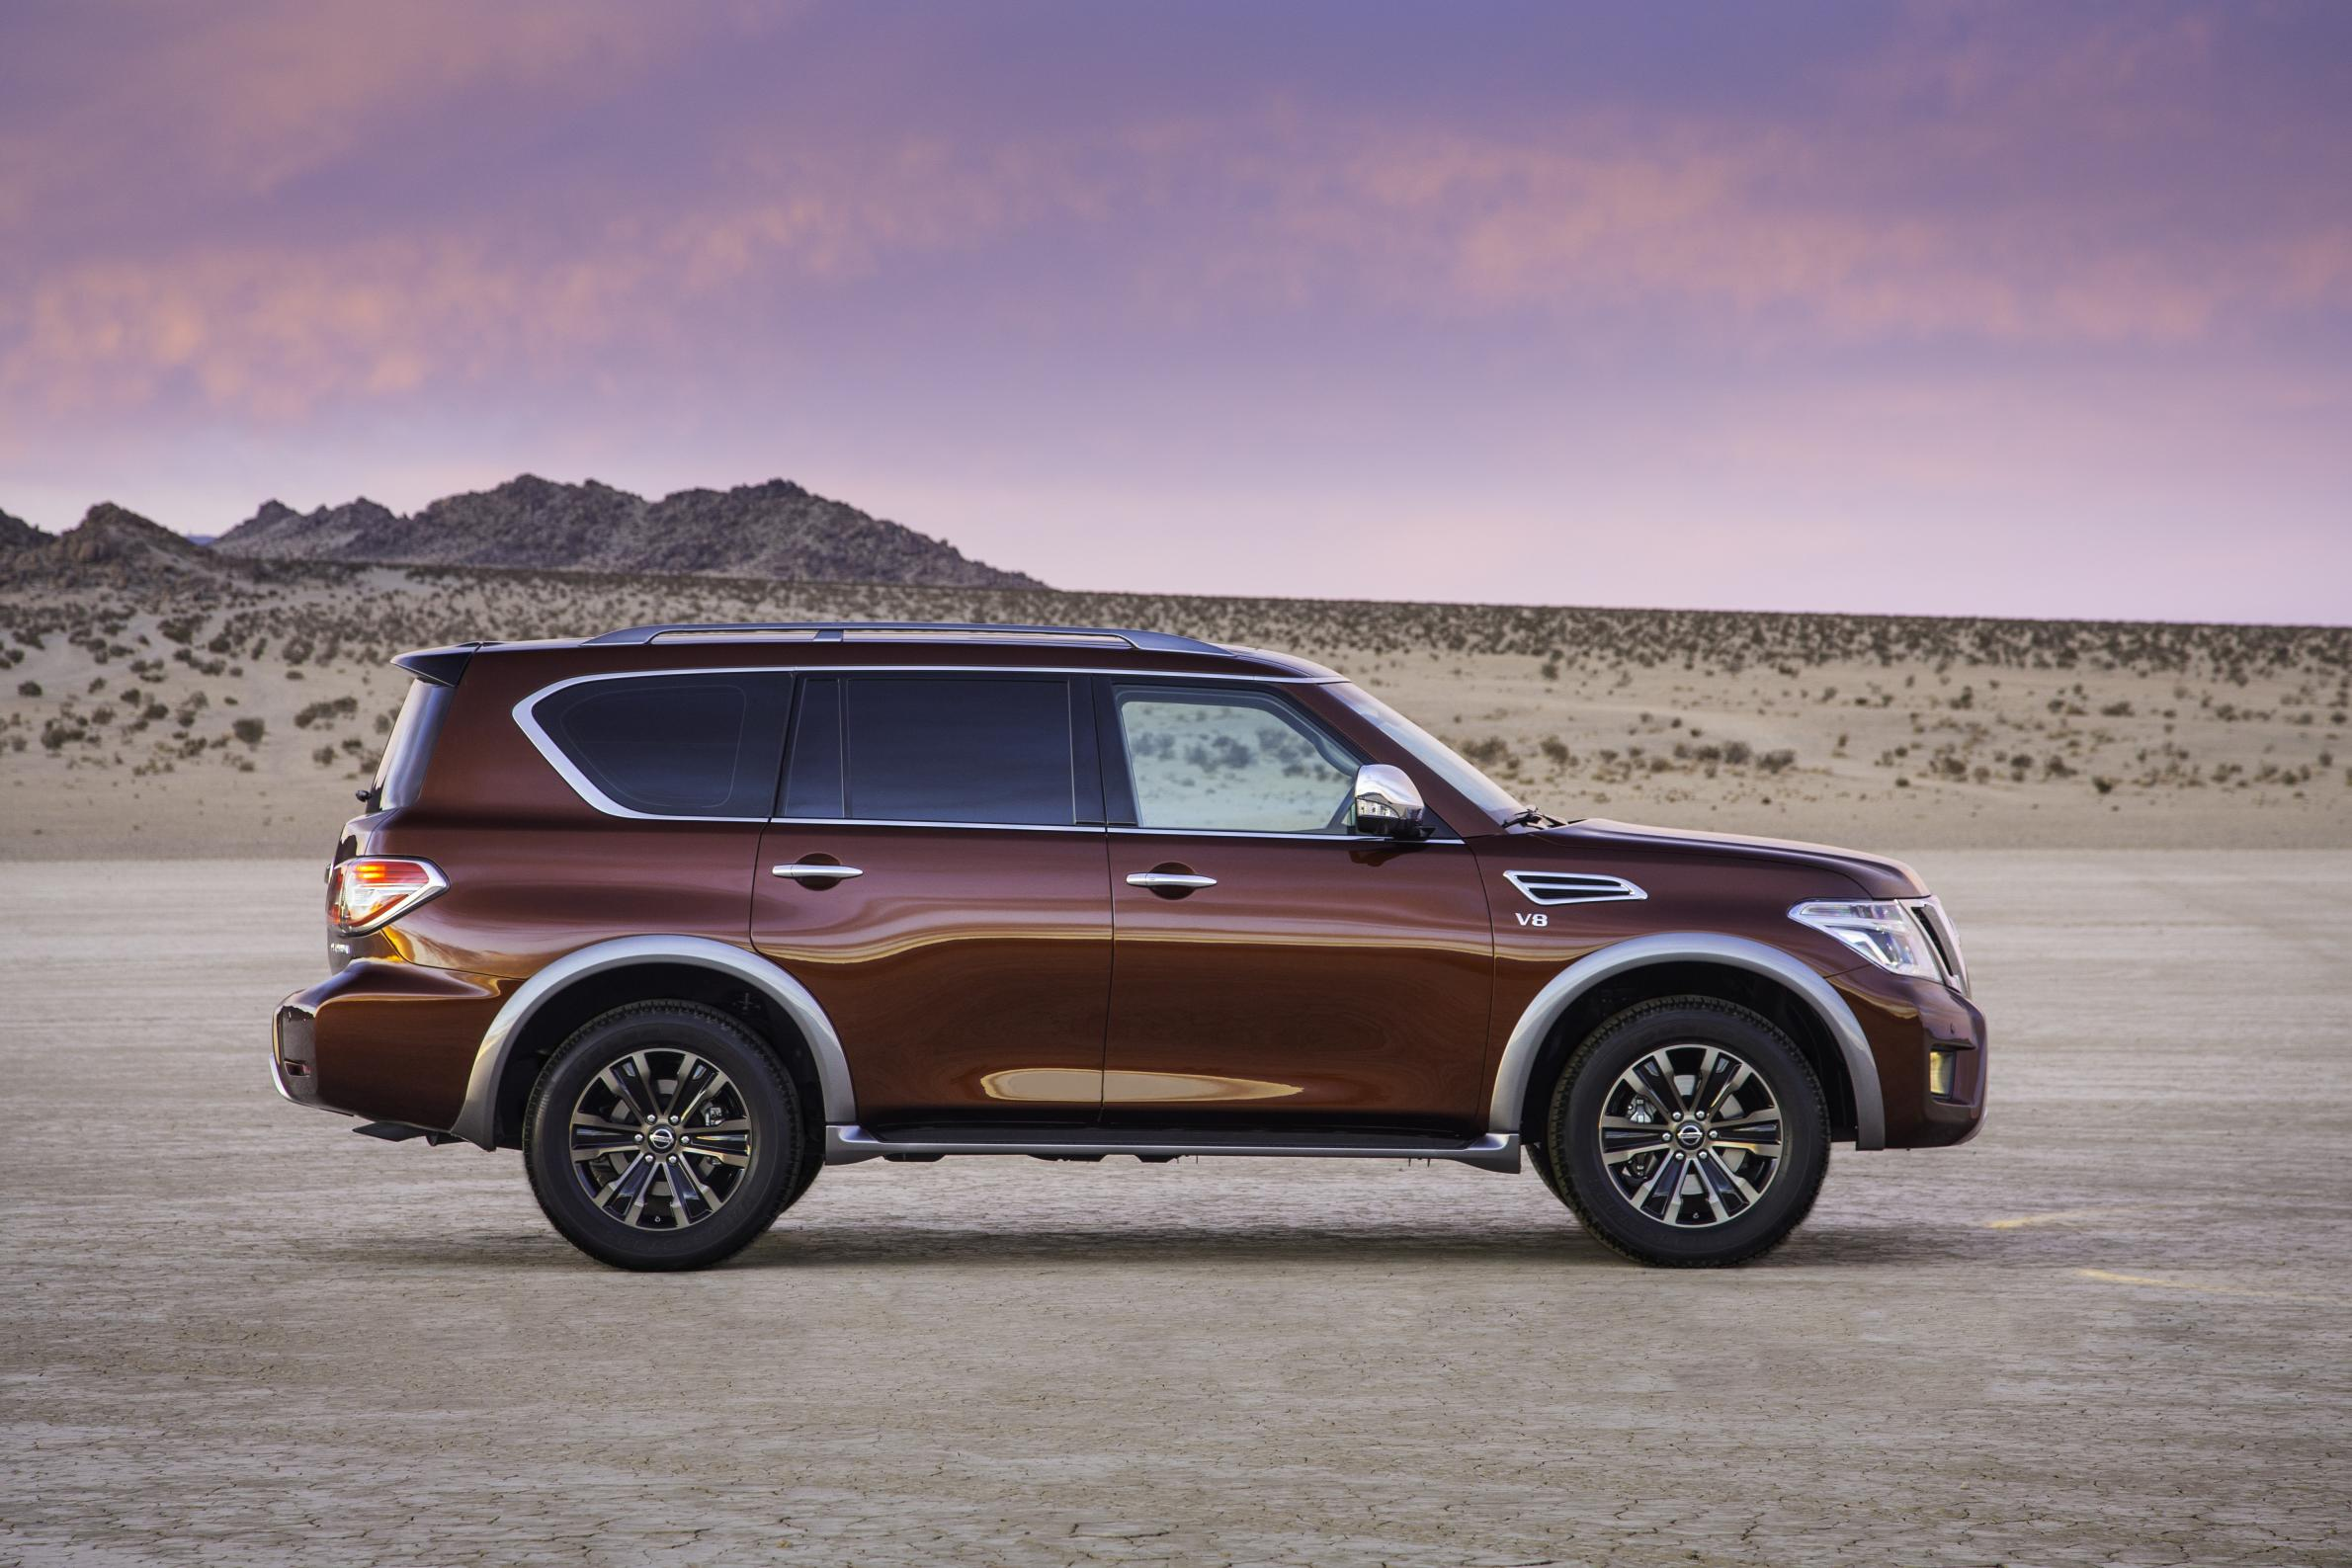 2017 Nissan Armada Is in Fact a Nissan Patrol Y62 ...